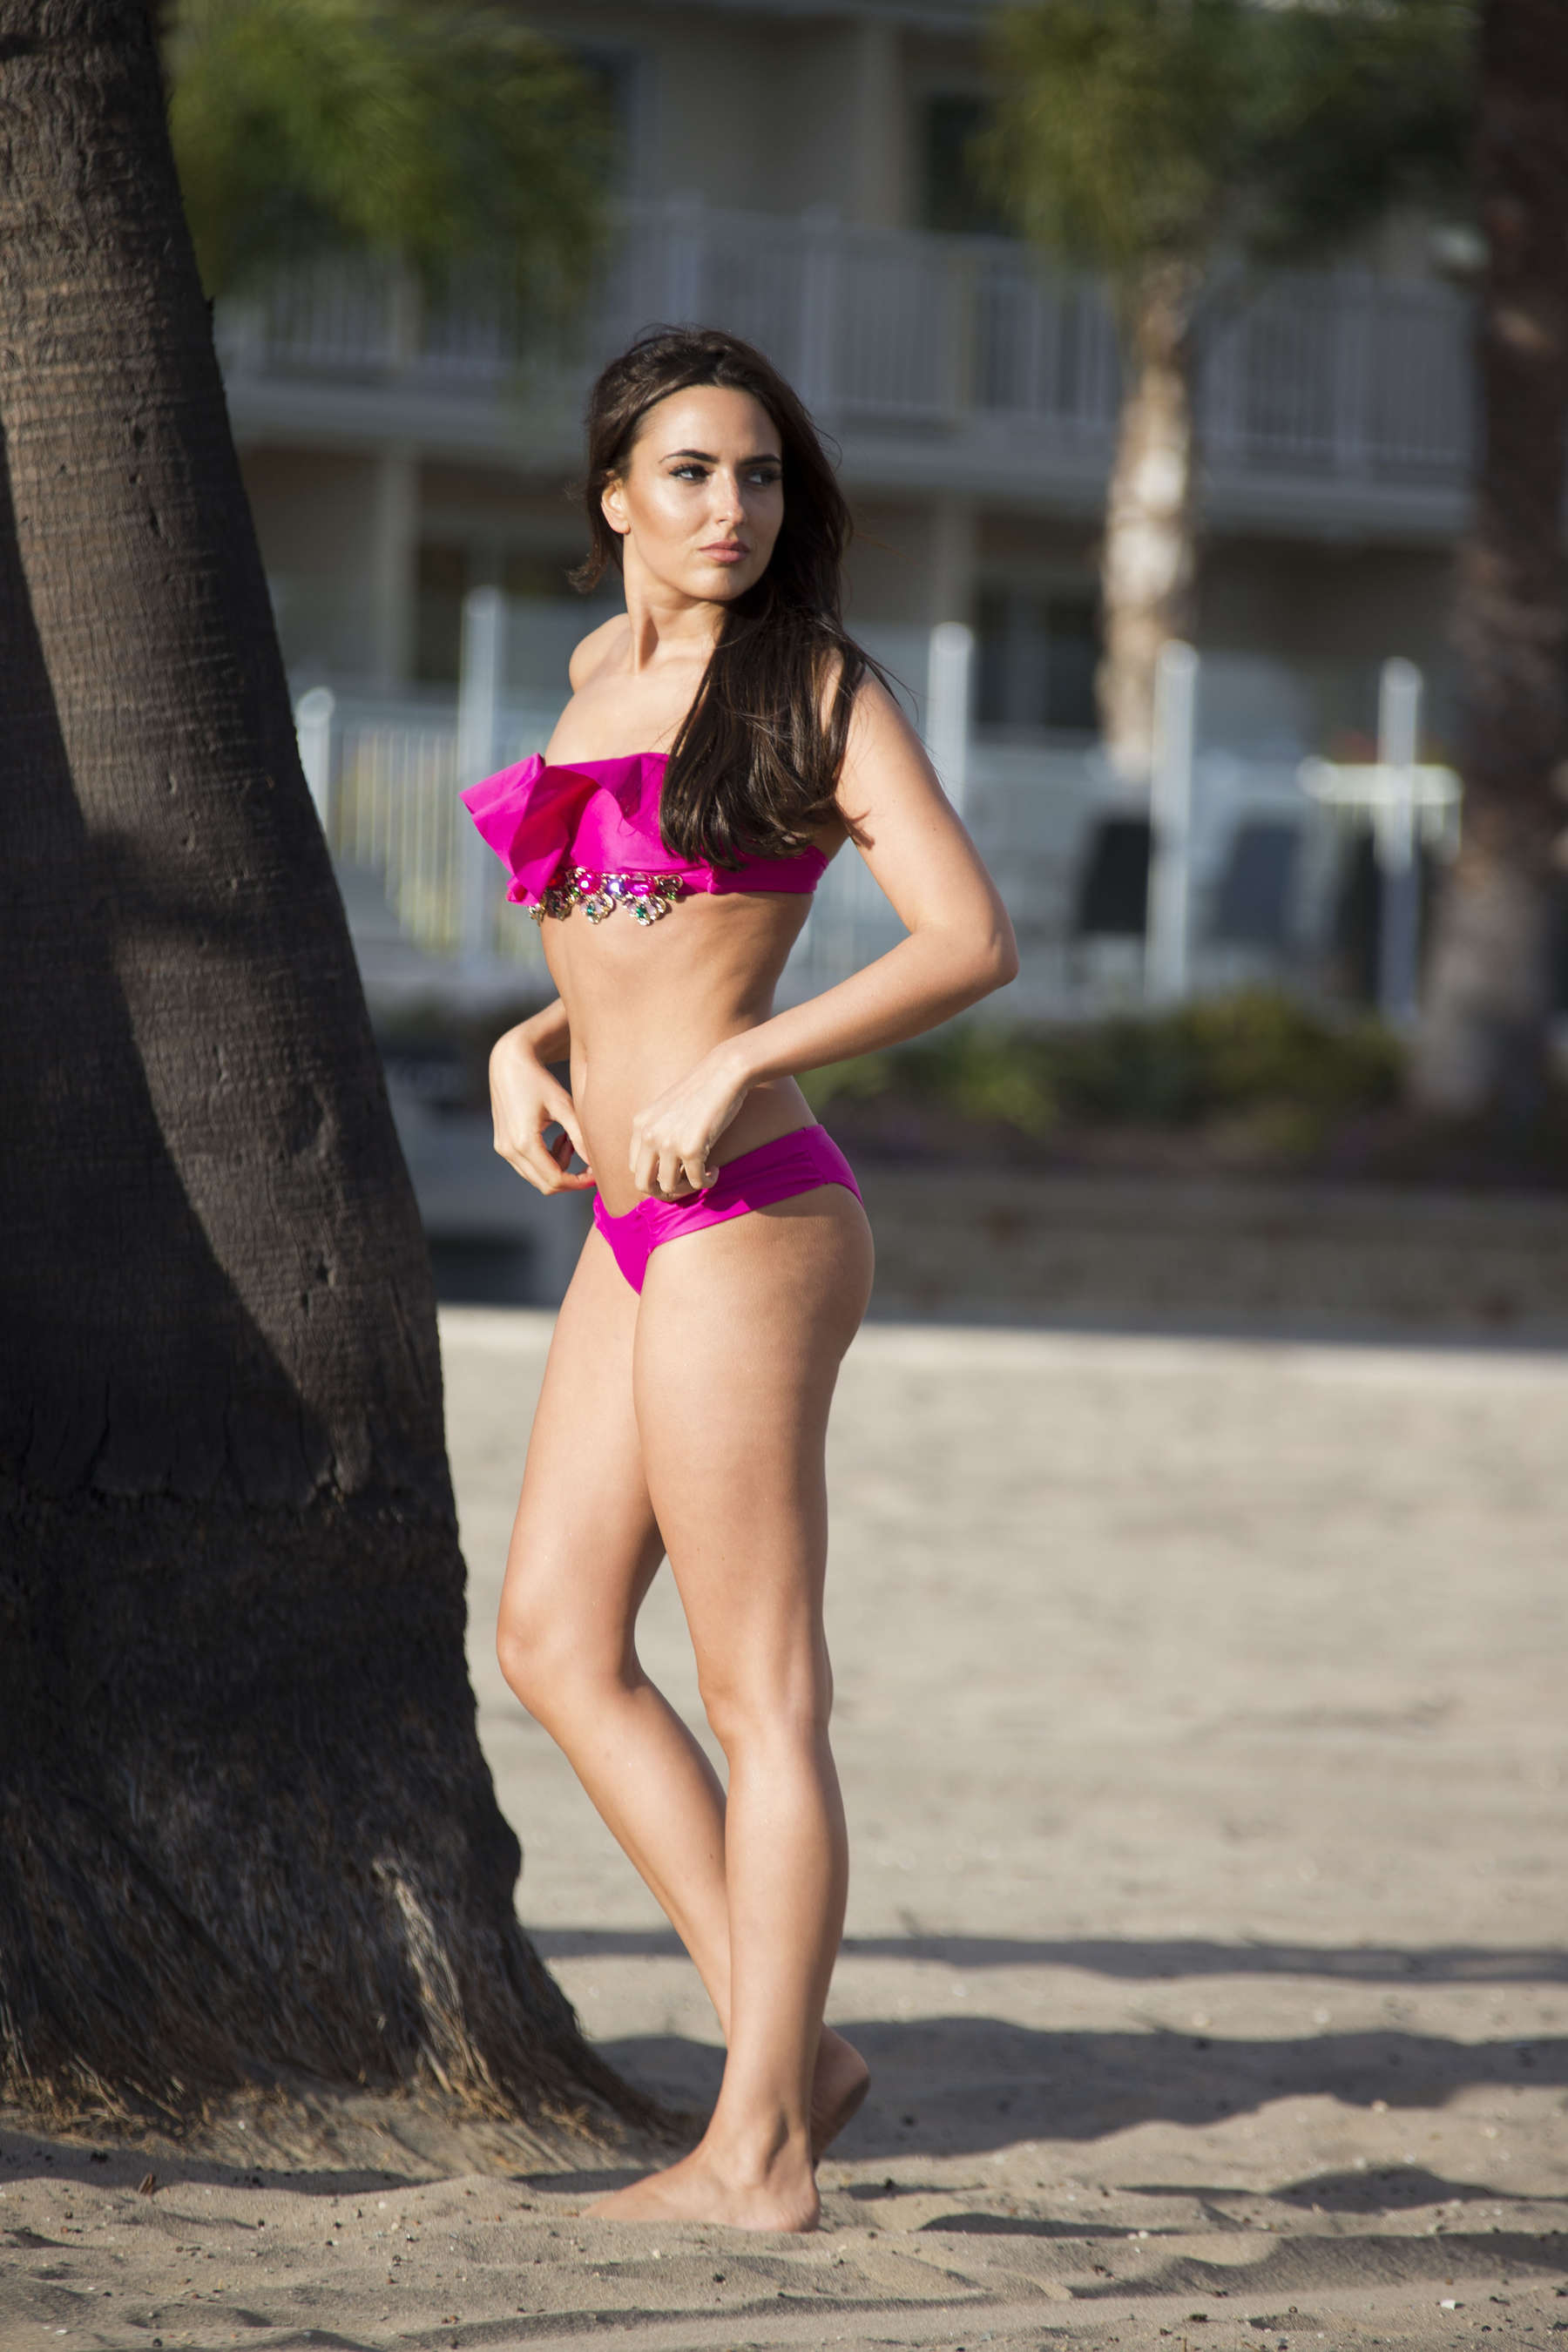 Nadia Forde 2016 : Nadia Forde in Pink Bikini -17